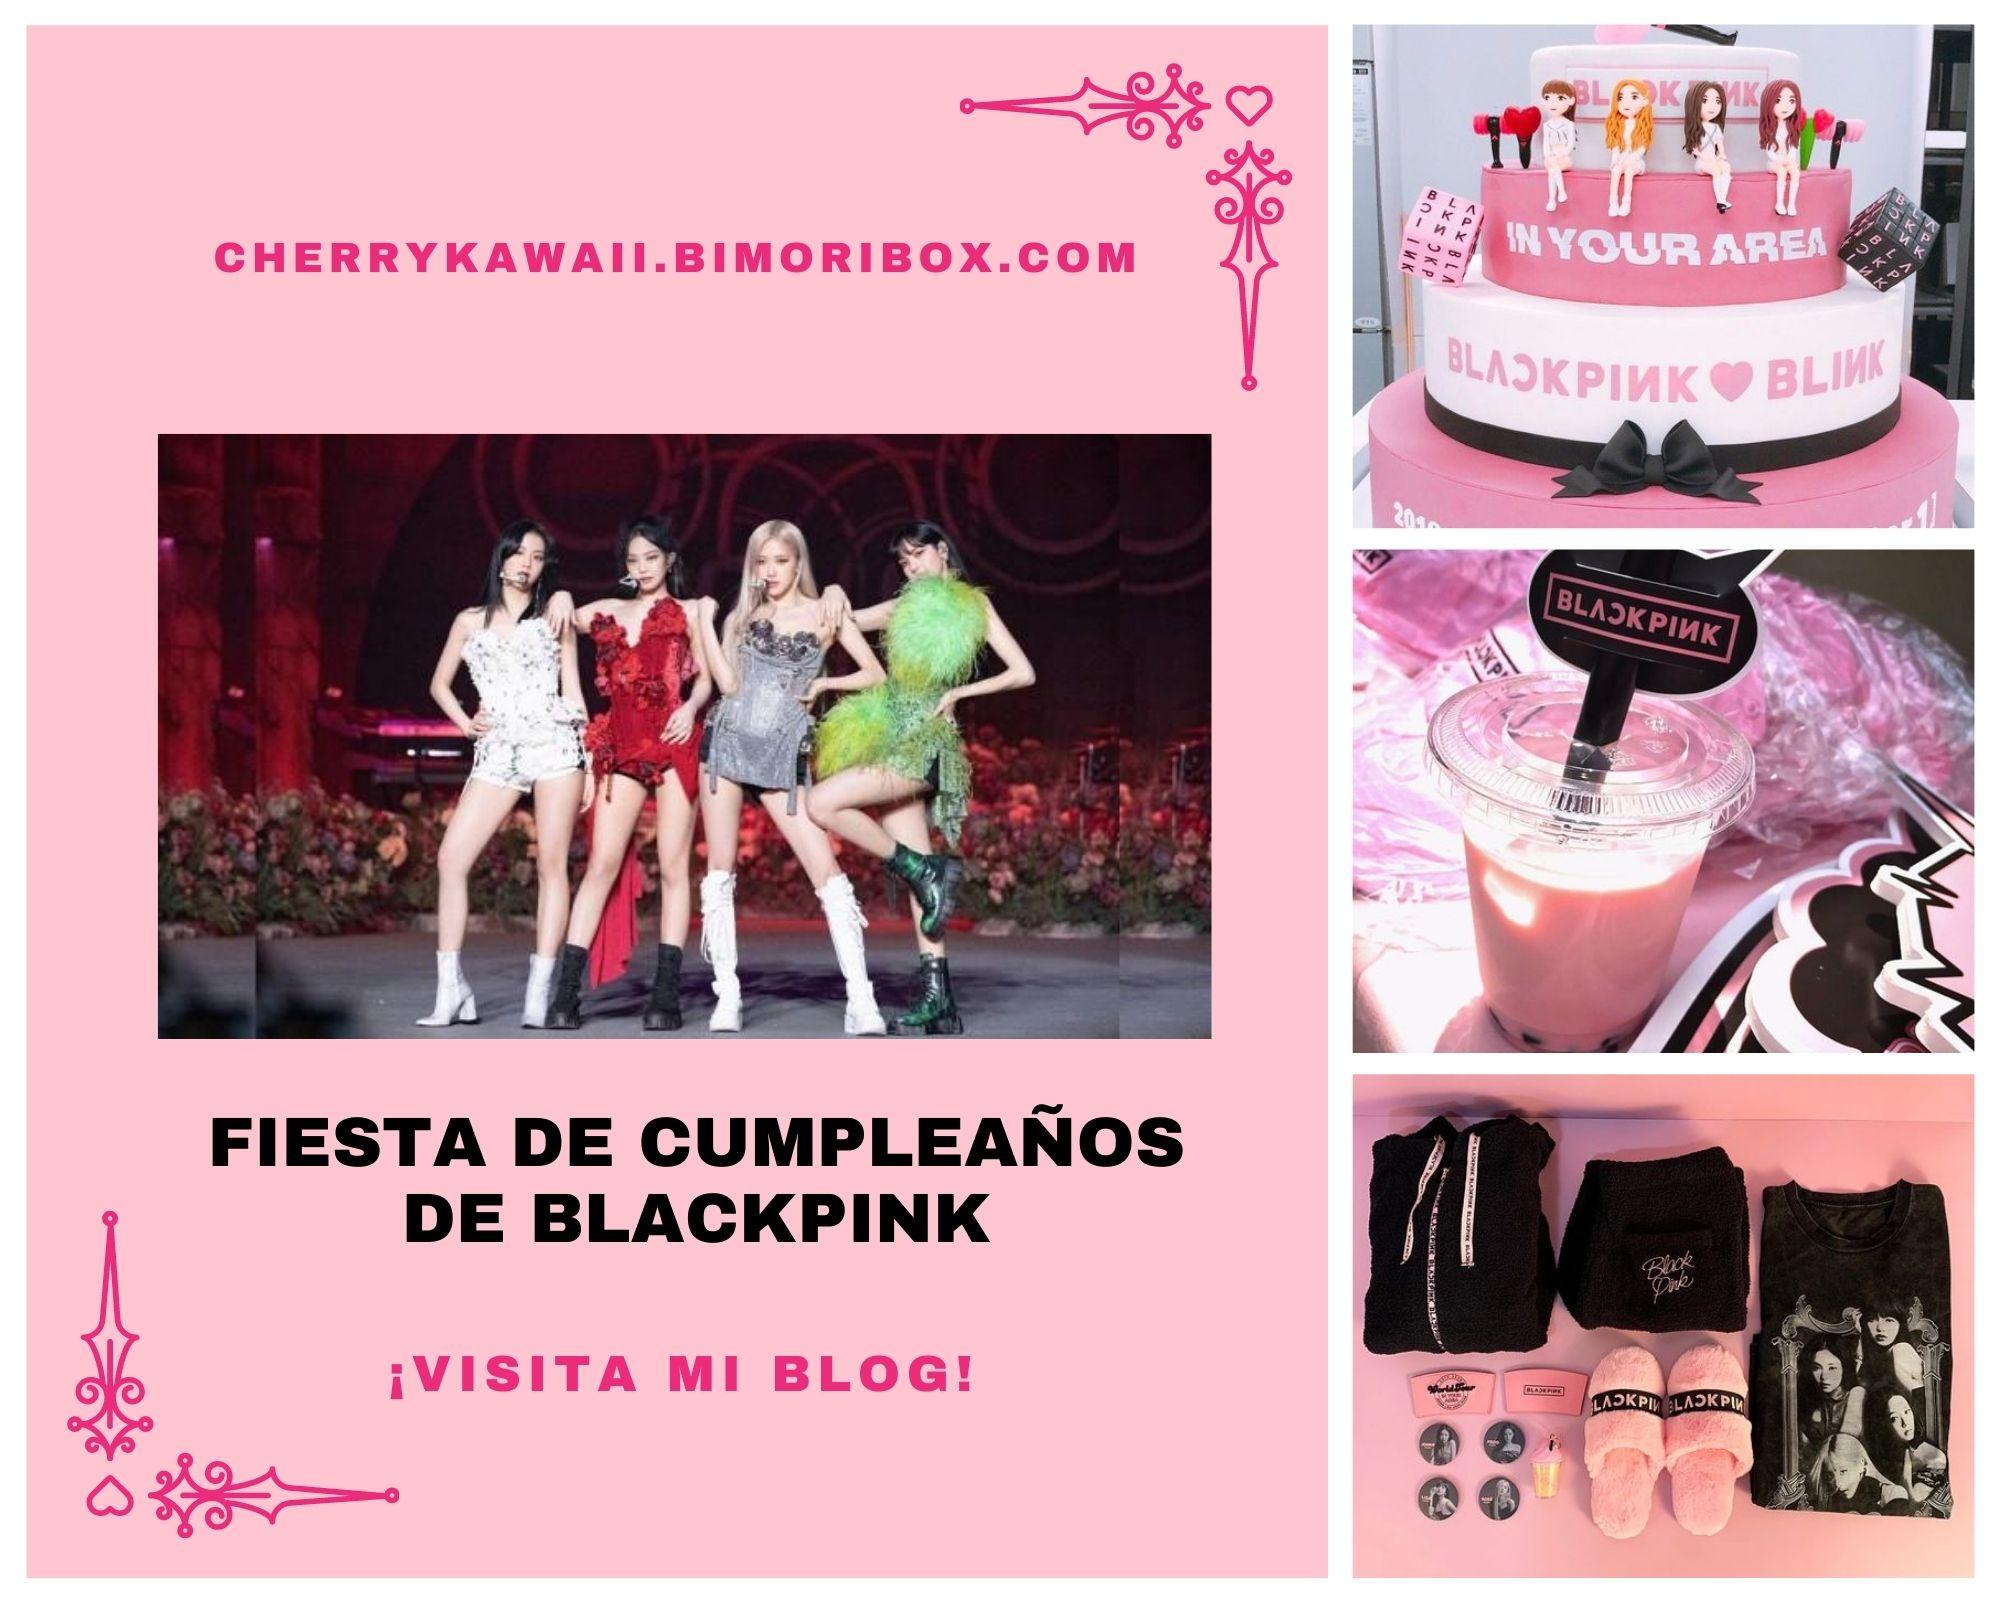 FIESTA DE BLACKPINK | TEMATICA DE CUMPLEAÑOS